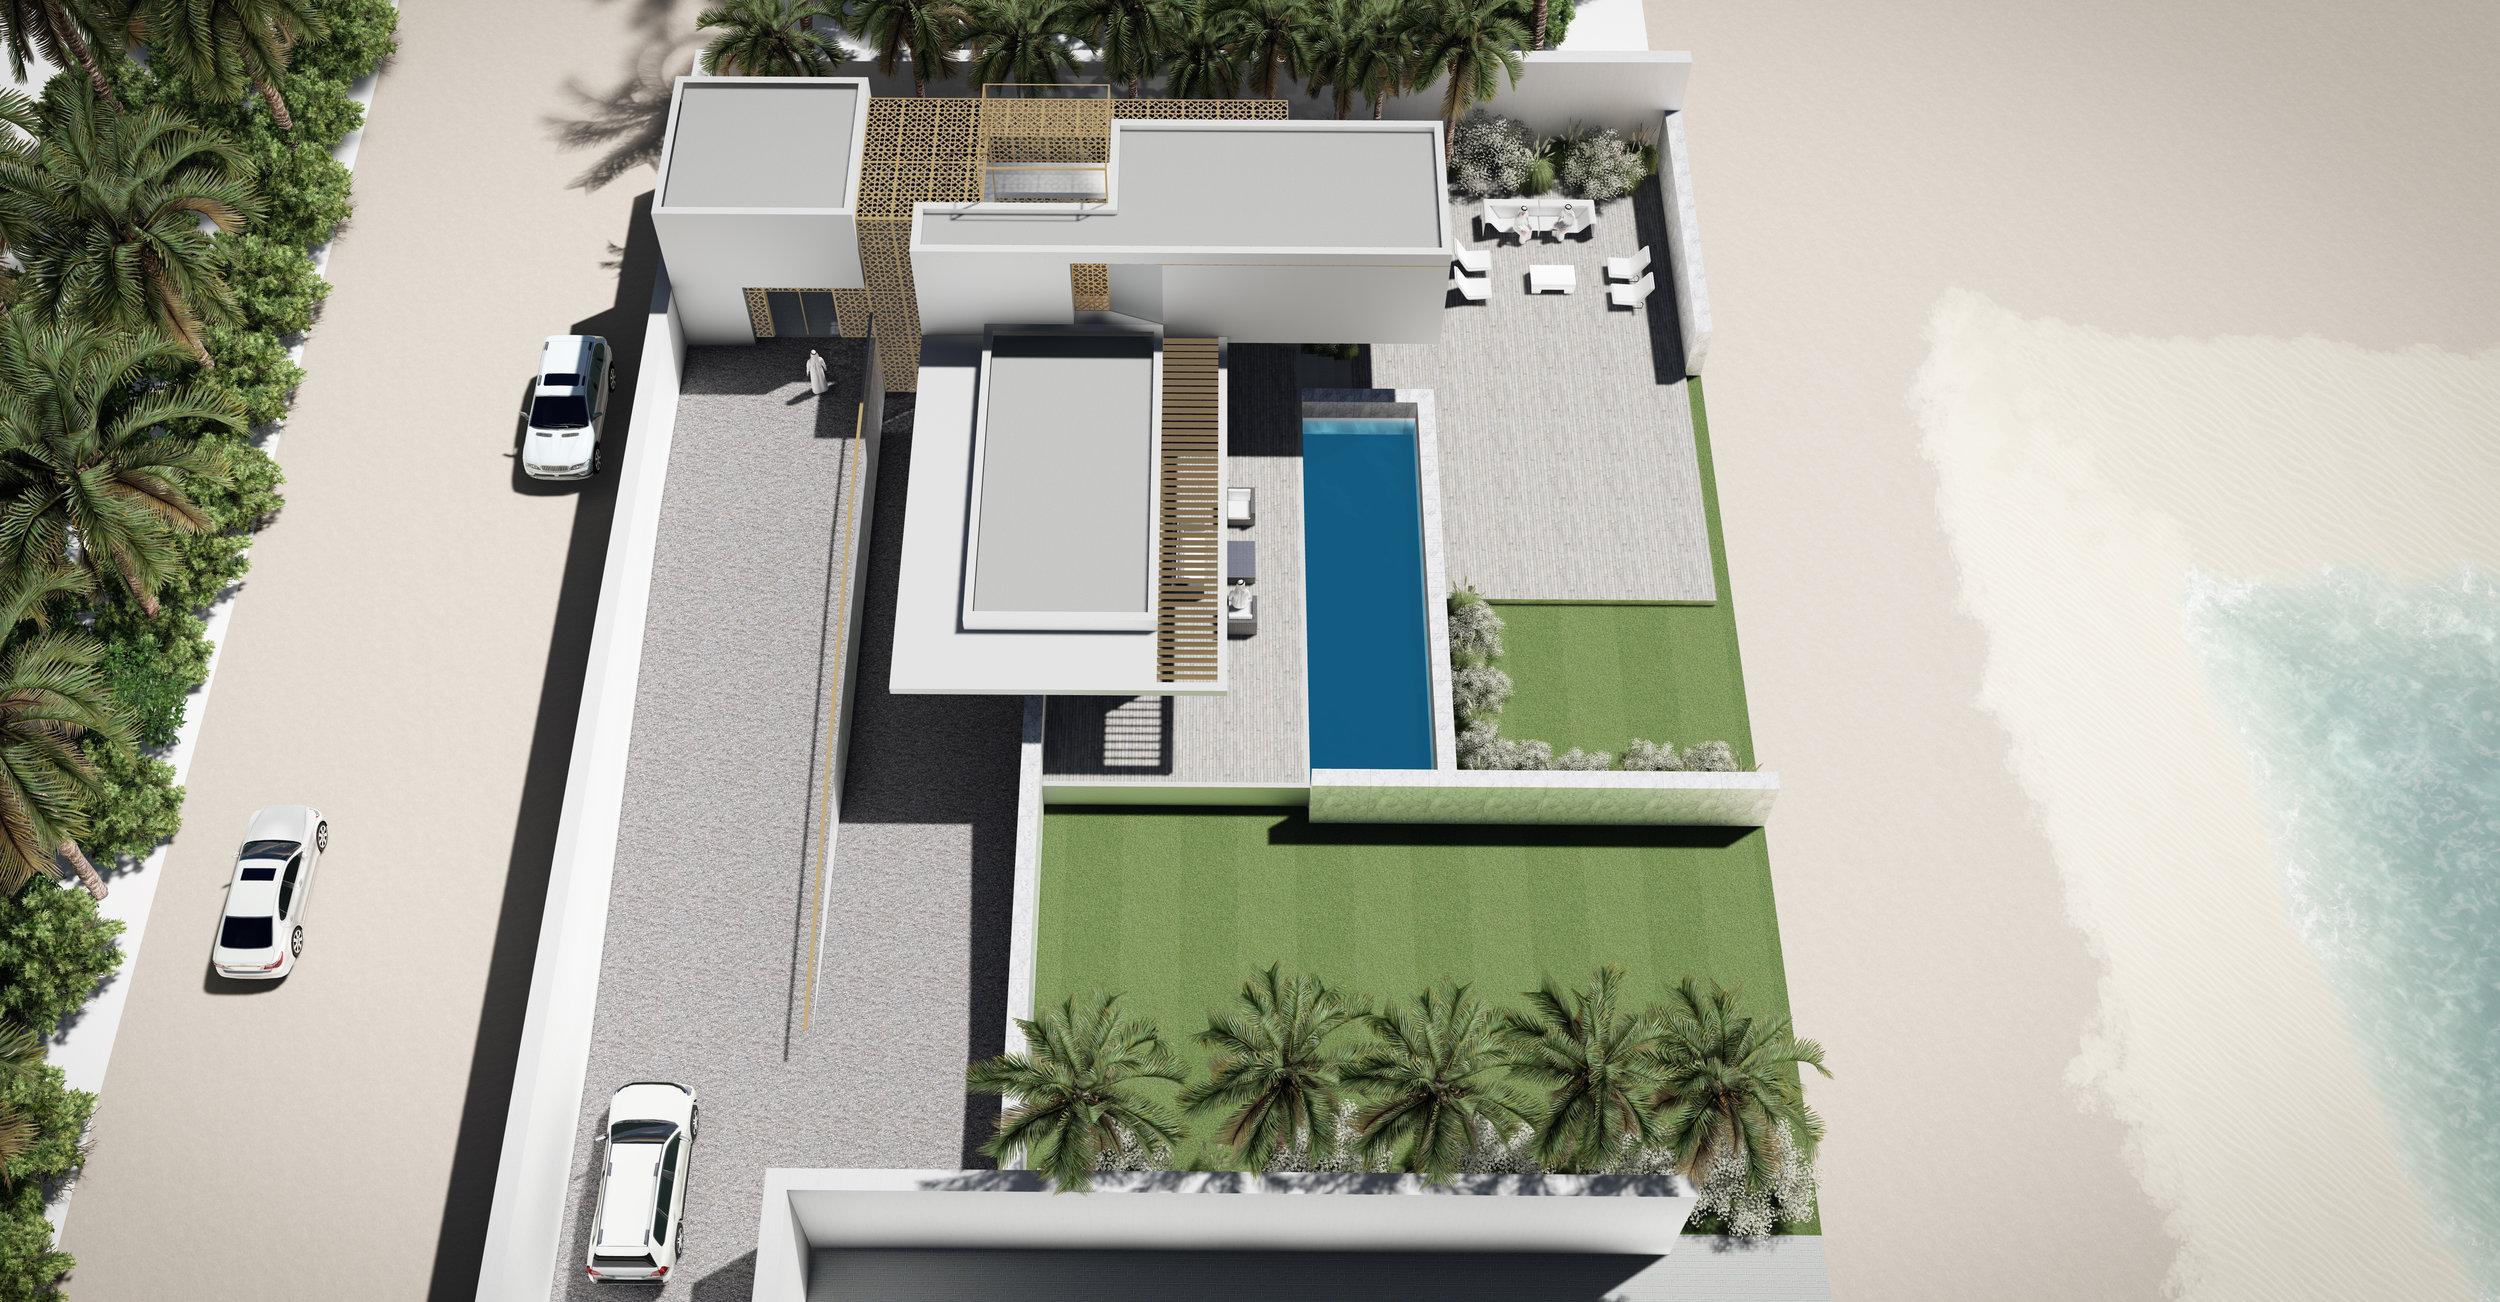 © Copyright Studio DS 2018 - the Beach Villa Aerial View